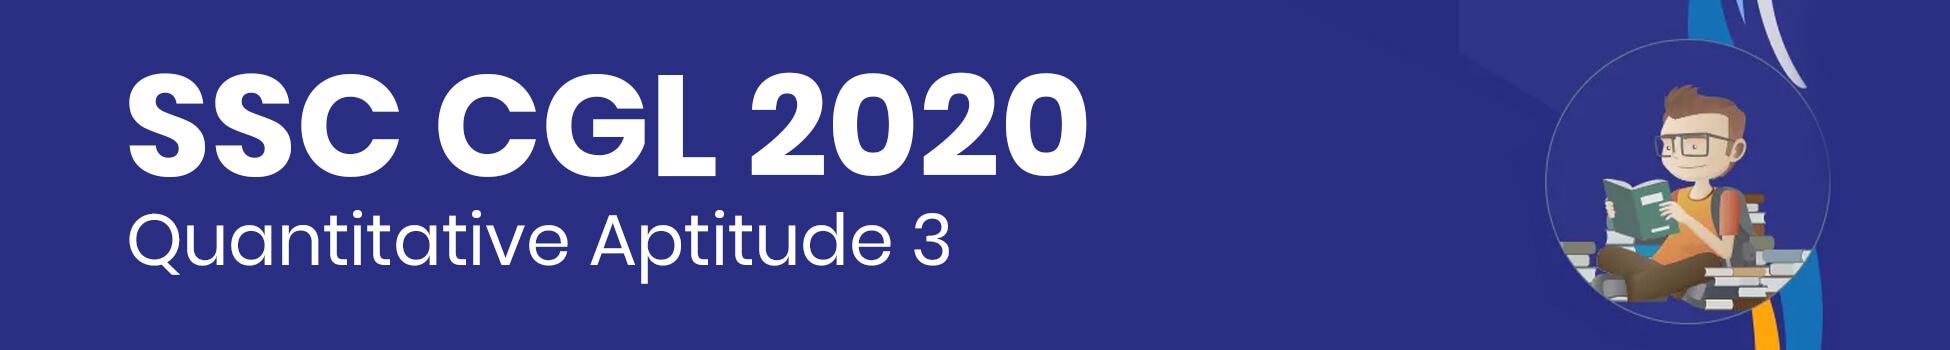 SSC CGL 2020: Quantitative Aptitude 3